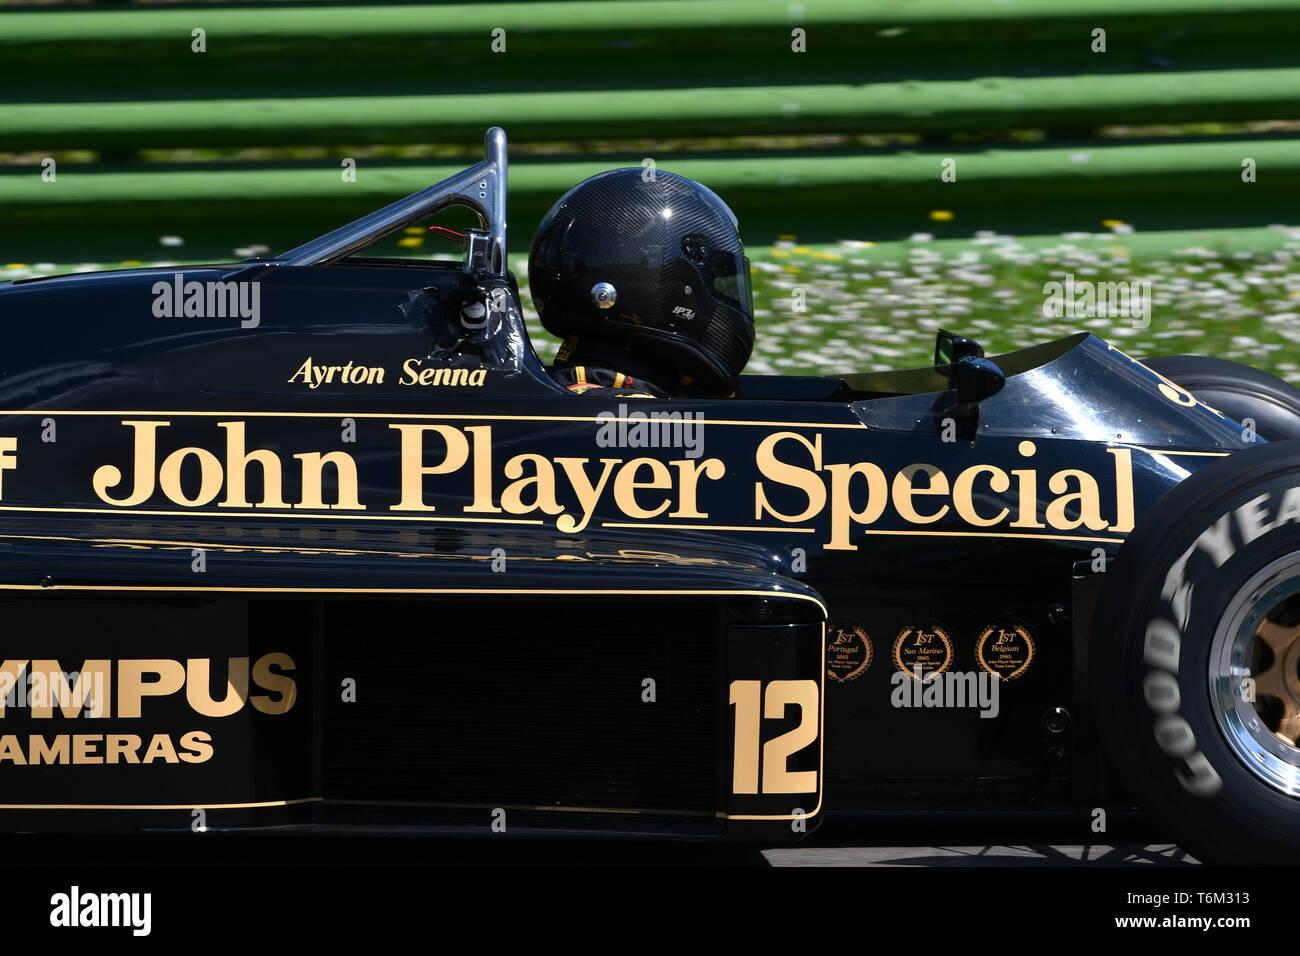 Imola, 27 April 2019: Historic 1985 F1 Lotus 97T/4 John Player Special ex Ayrton Senna in action during Minardi Historic Day 2019 at Imola Circuit in  - Stock Image